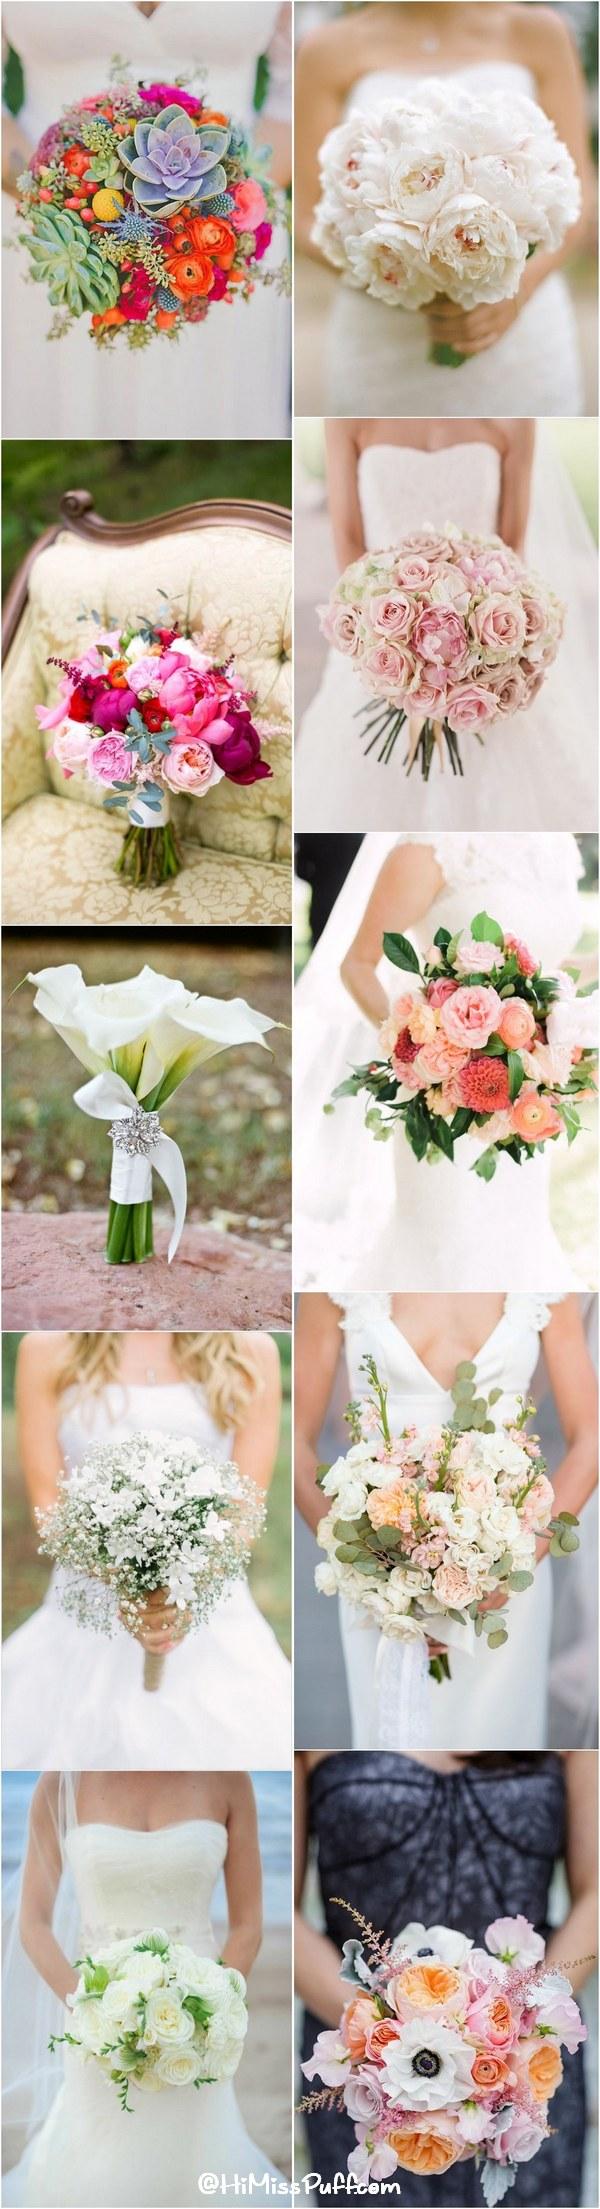 100 Romantic Spring & Summer Wedding Bouquets / http://www.himisspuff.com/spring-summer-wedding-bouquets/